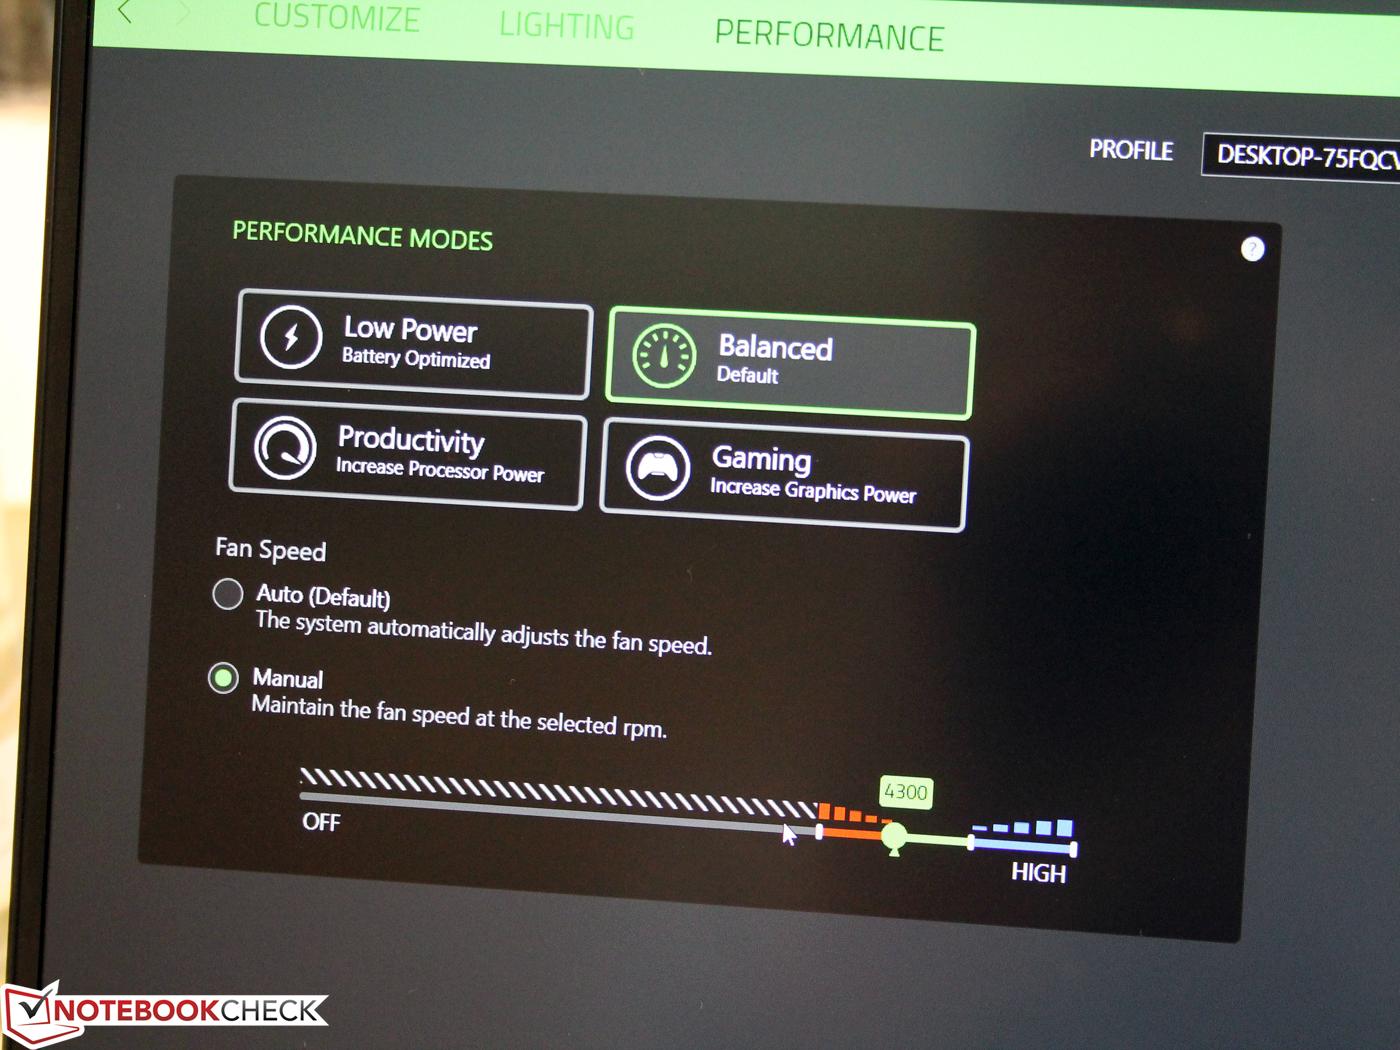 Premières impressions du PC portable Razer Blade 15 (2018